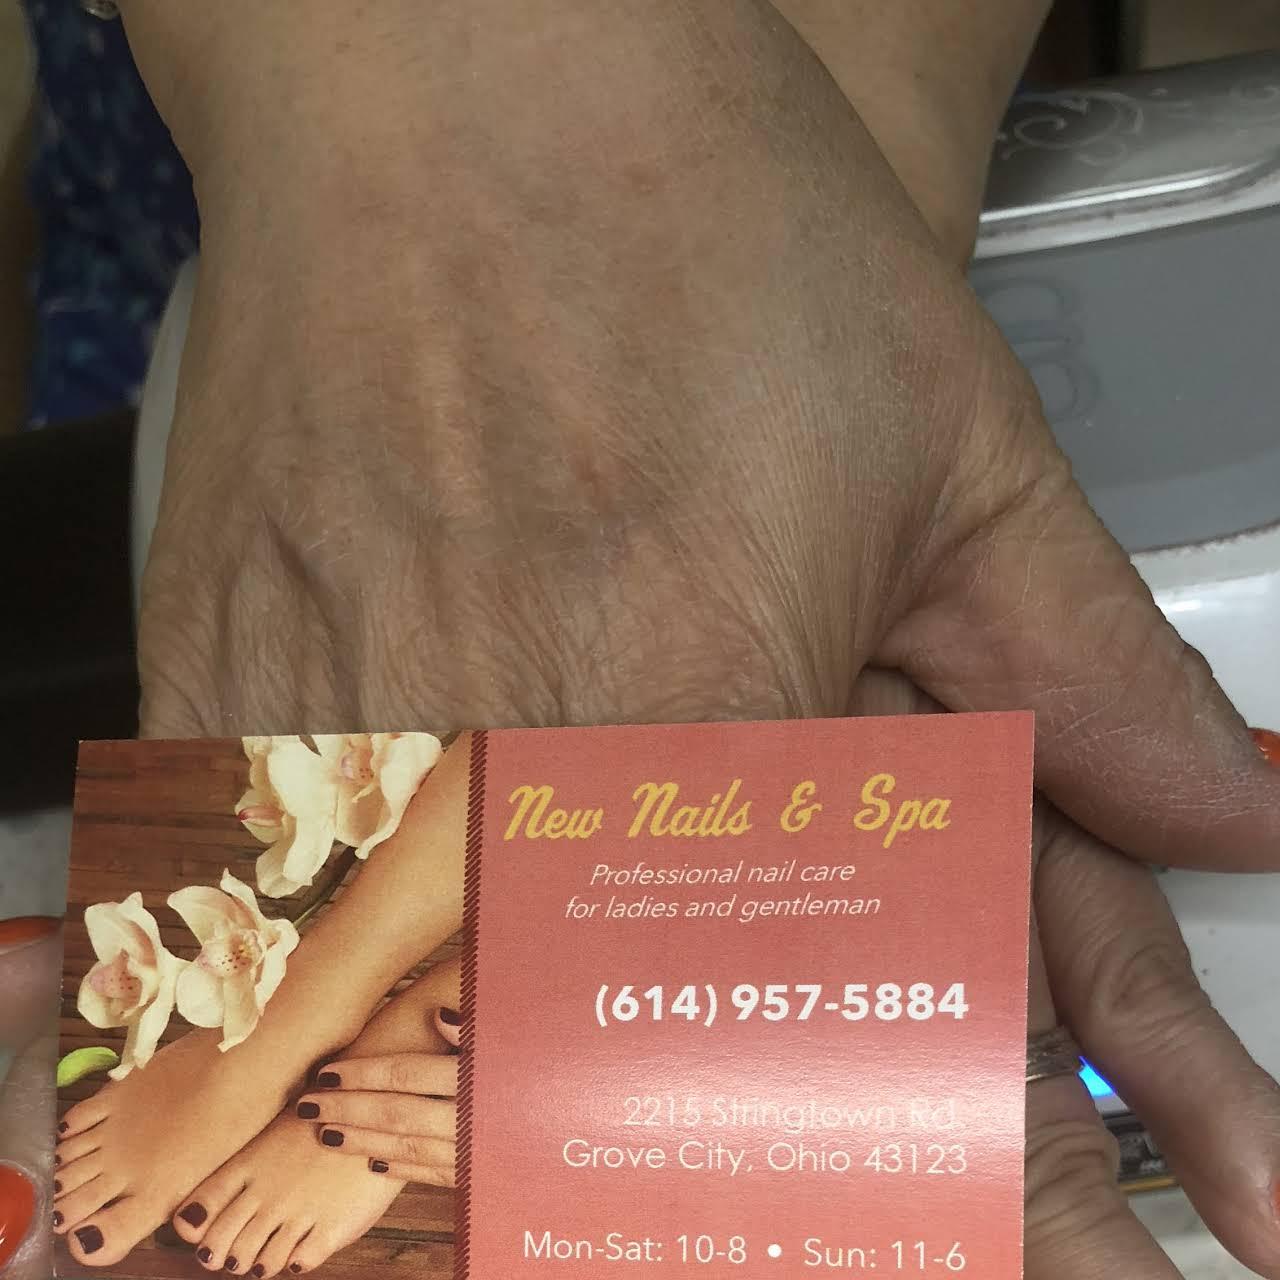 New Nails & Spa - Nail Salon in Grove City